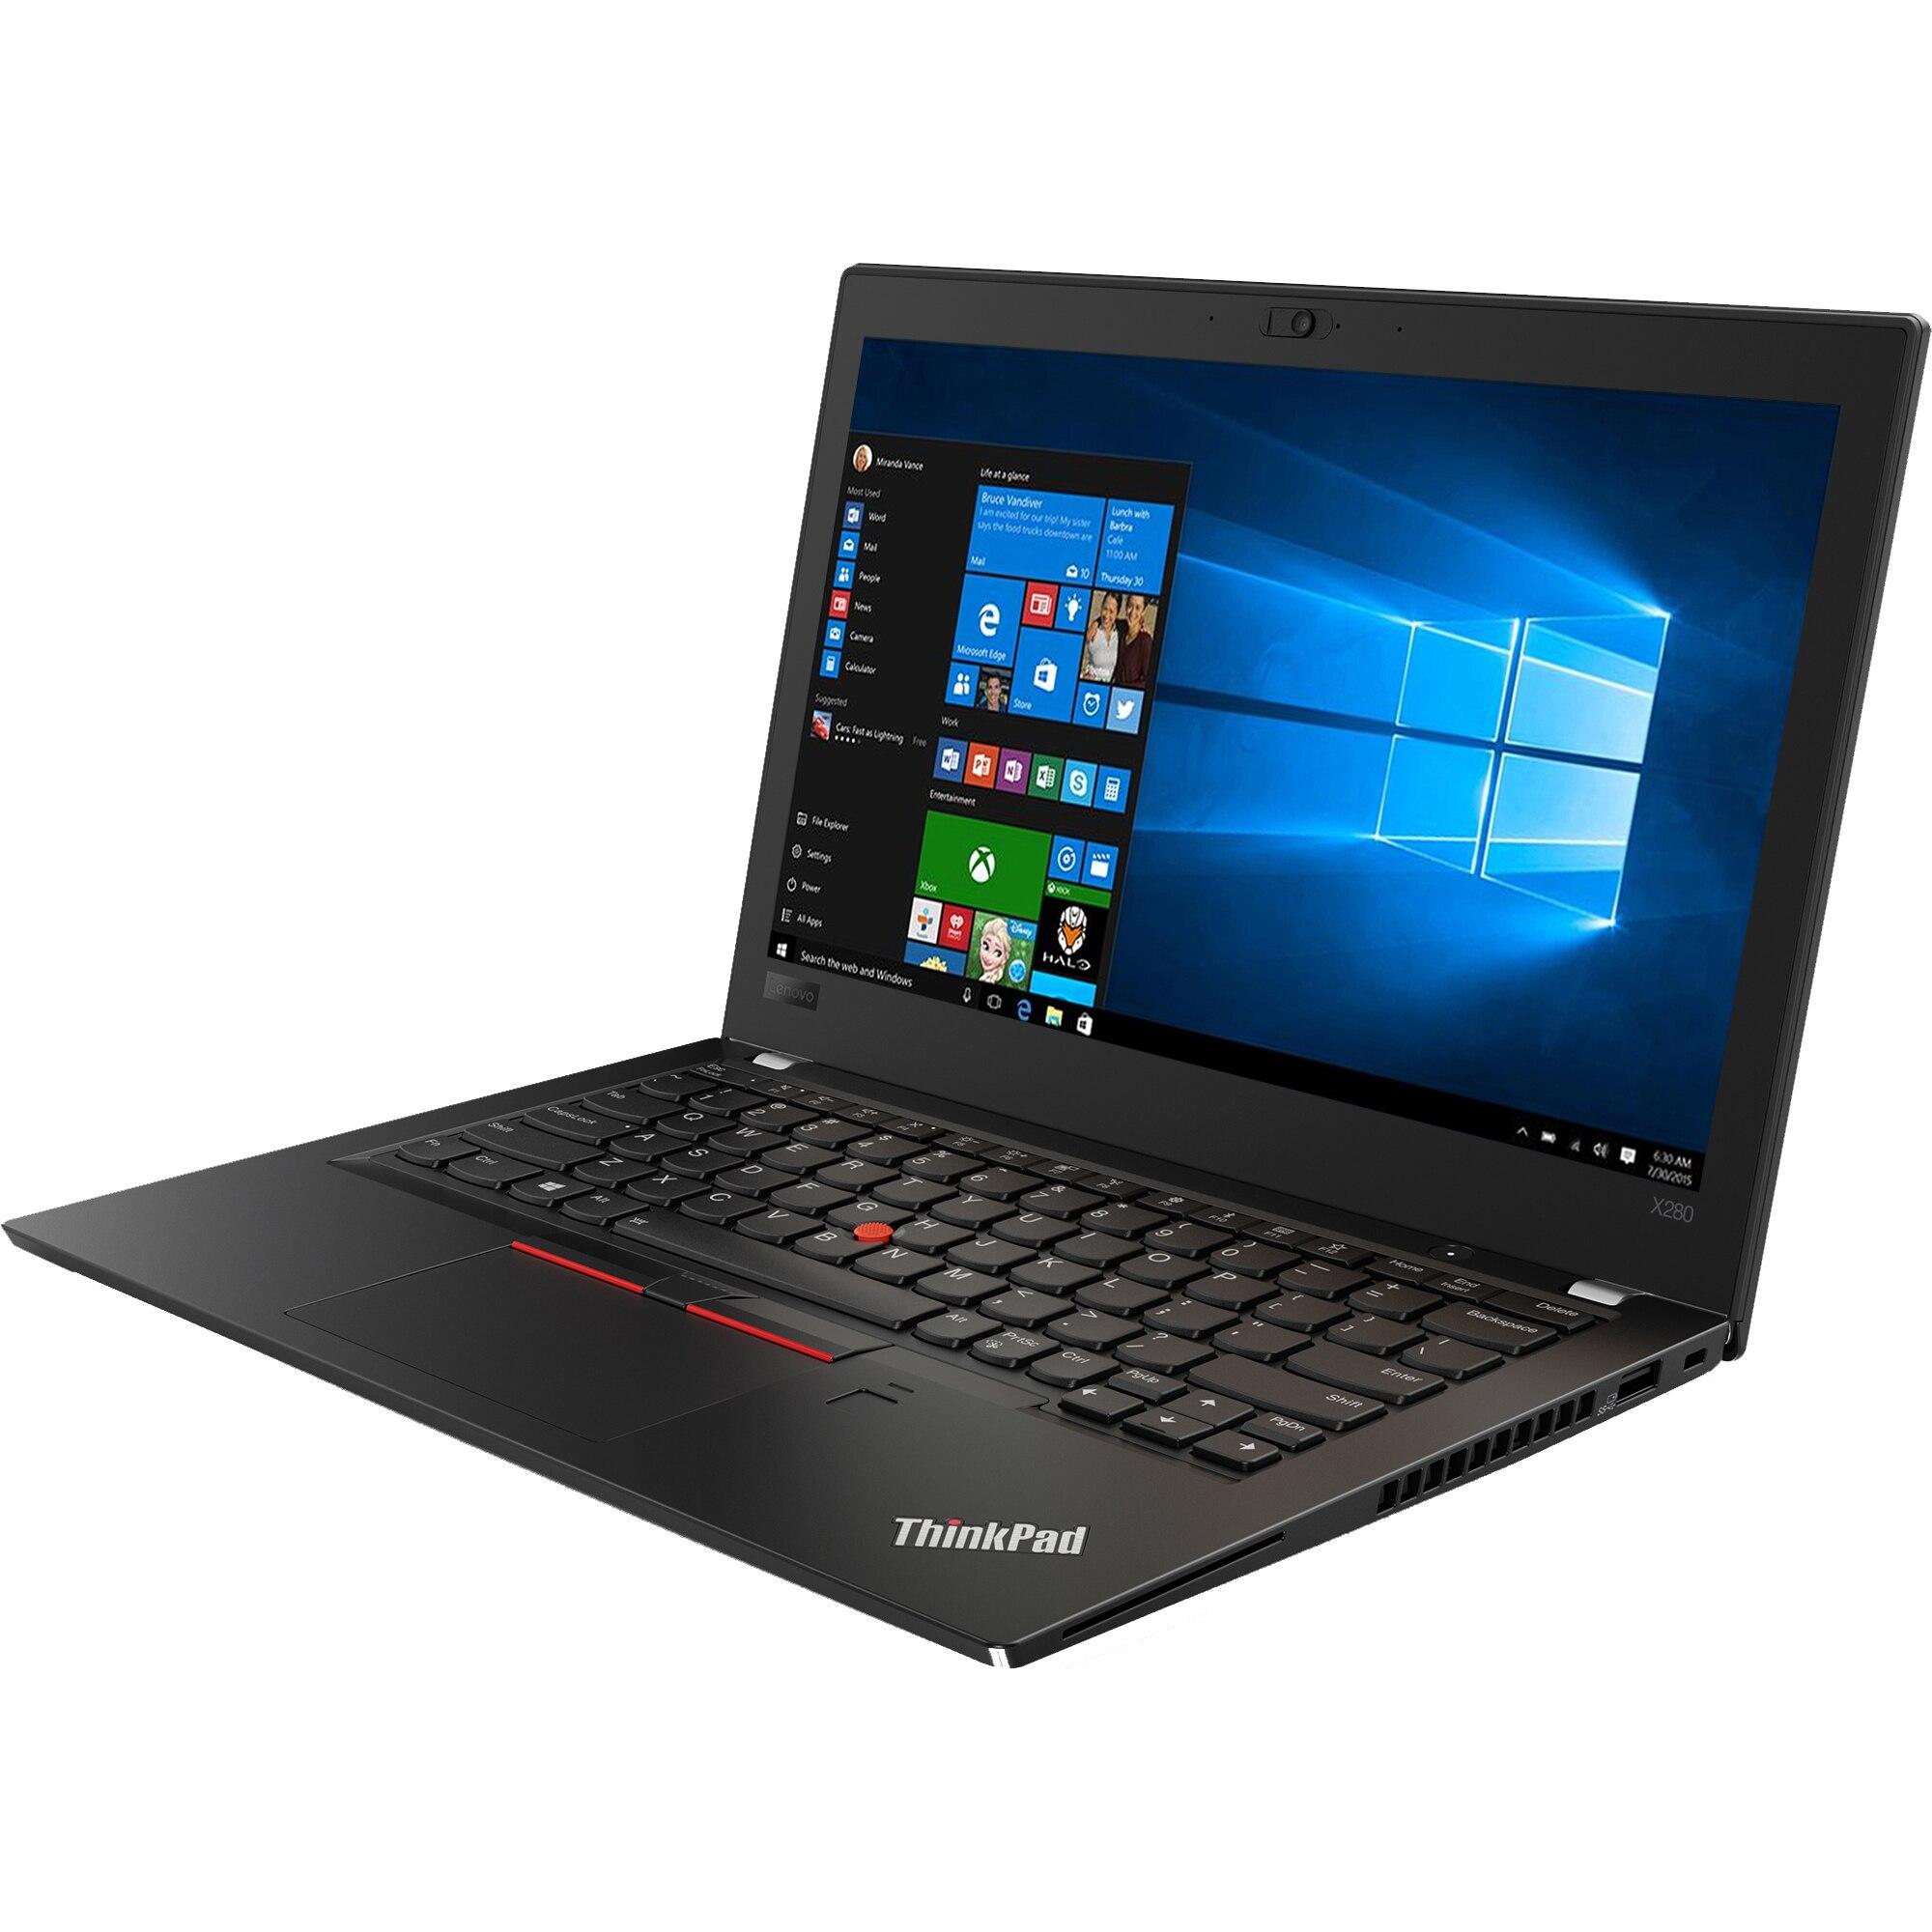 "Laptop Lenovo ThinkPad x280, Intel Core i5 8350U 1.7 GHz, 8 GB DDR4, 256 GB M.2 NVMe, Intel UHD Graphics 620, WI-FI, Bluetooth, WebCam, Display 12.5"" 1920 by 1080, TouchScreen, Windows 10 Pro, 3 Ani Garantie - imaginea 1"